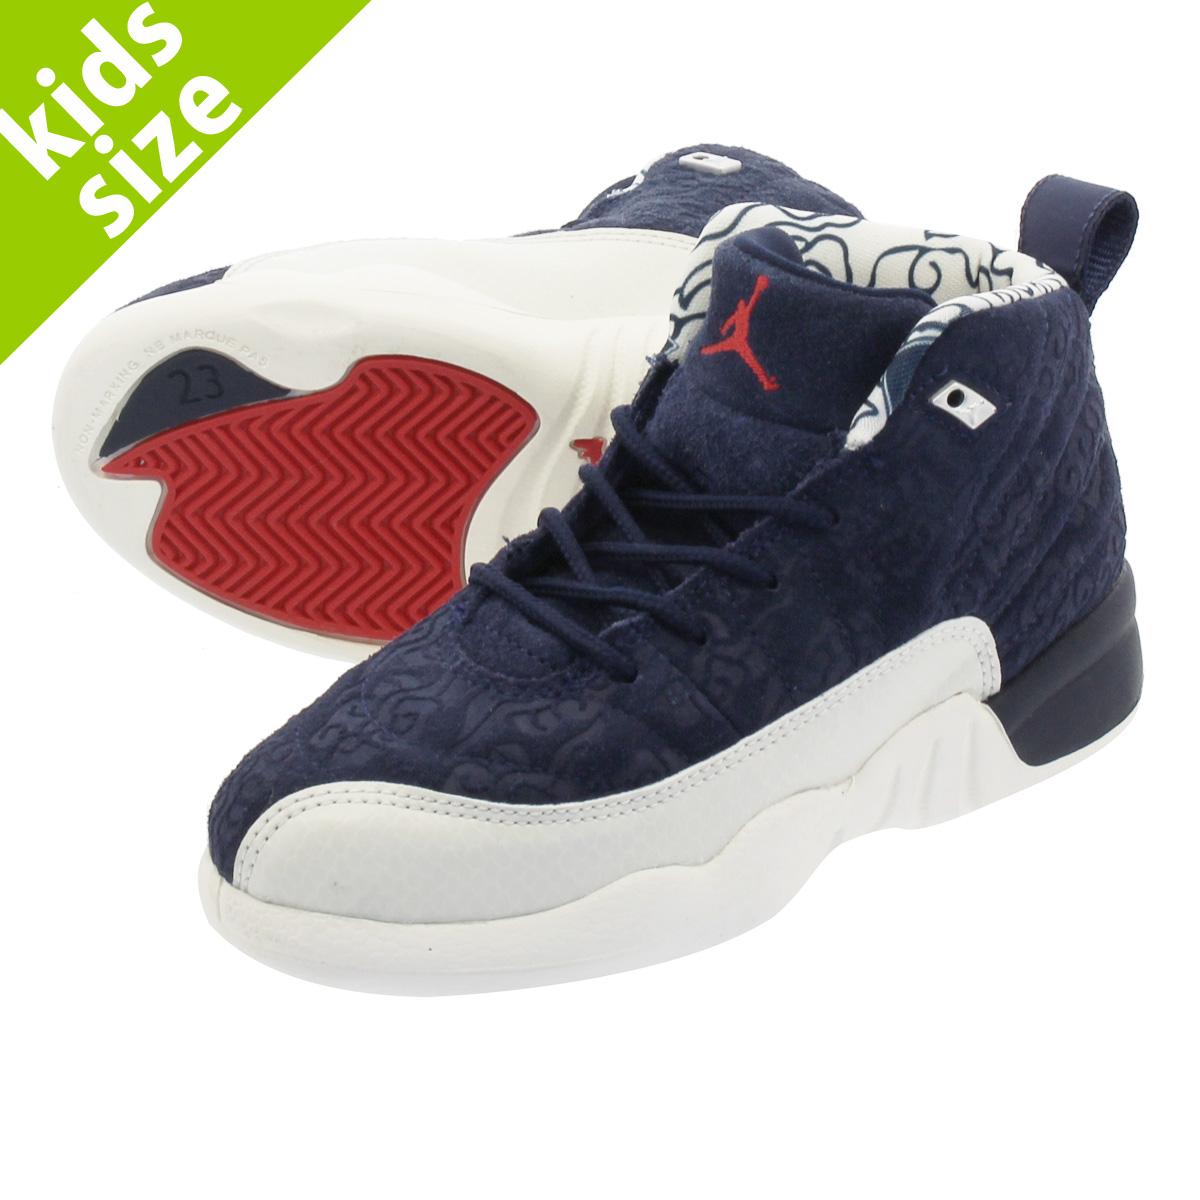 7c63c186e455 LOWTEX PLUS  NIKE AIR JORDAN 12 RETRO PS Nike Air Jordan 12 nostalgic PS  COLLEGE NAVY SAIL UNIVERSITY RED bv8018-445